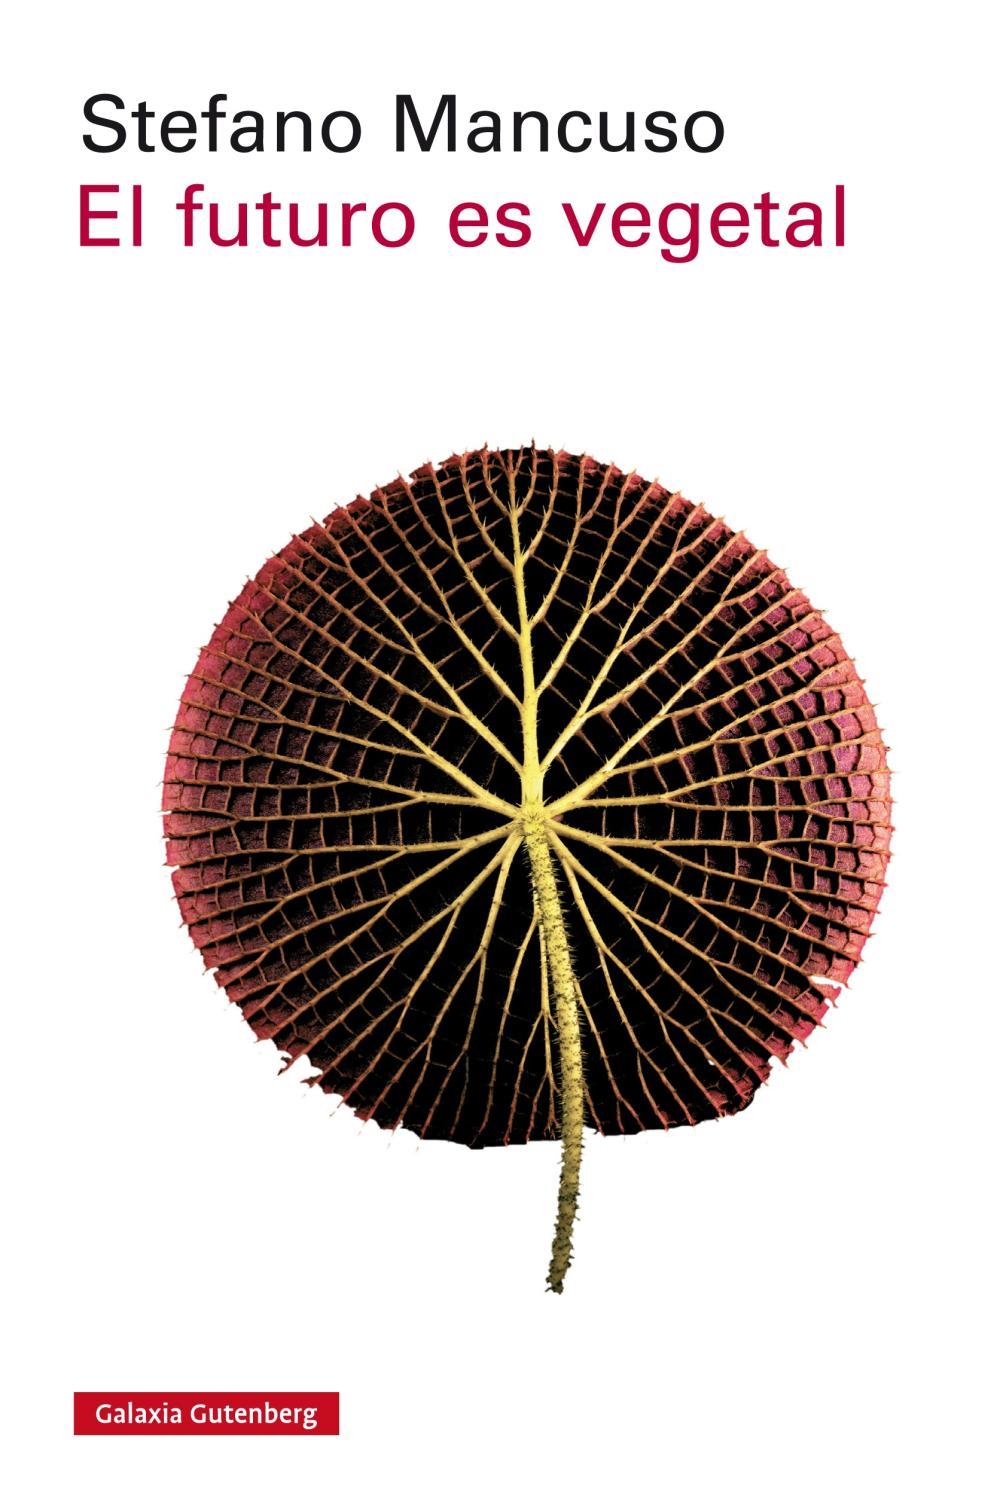 El futuro es vegetal